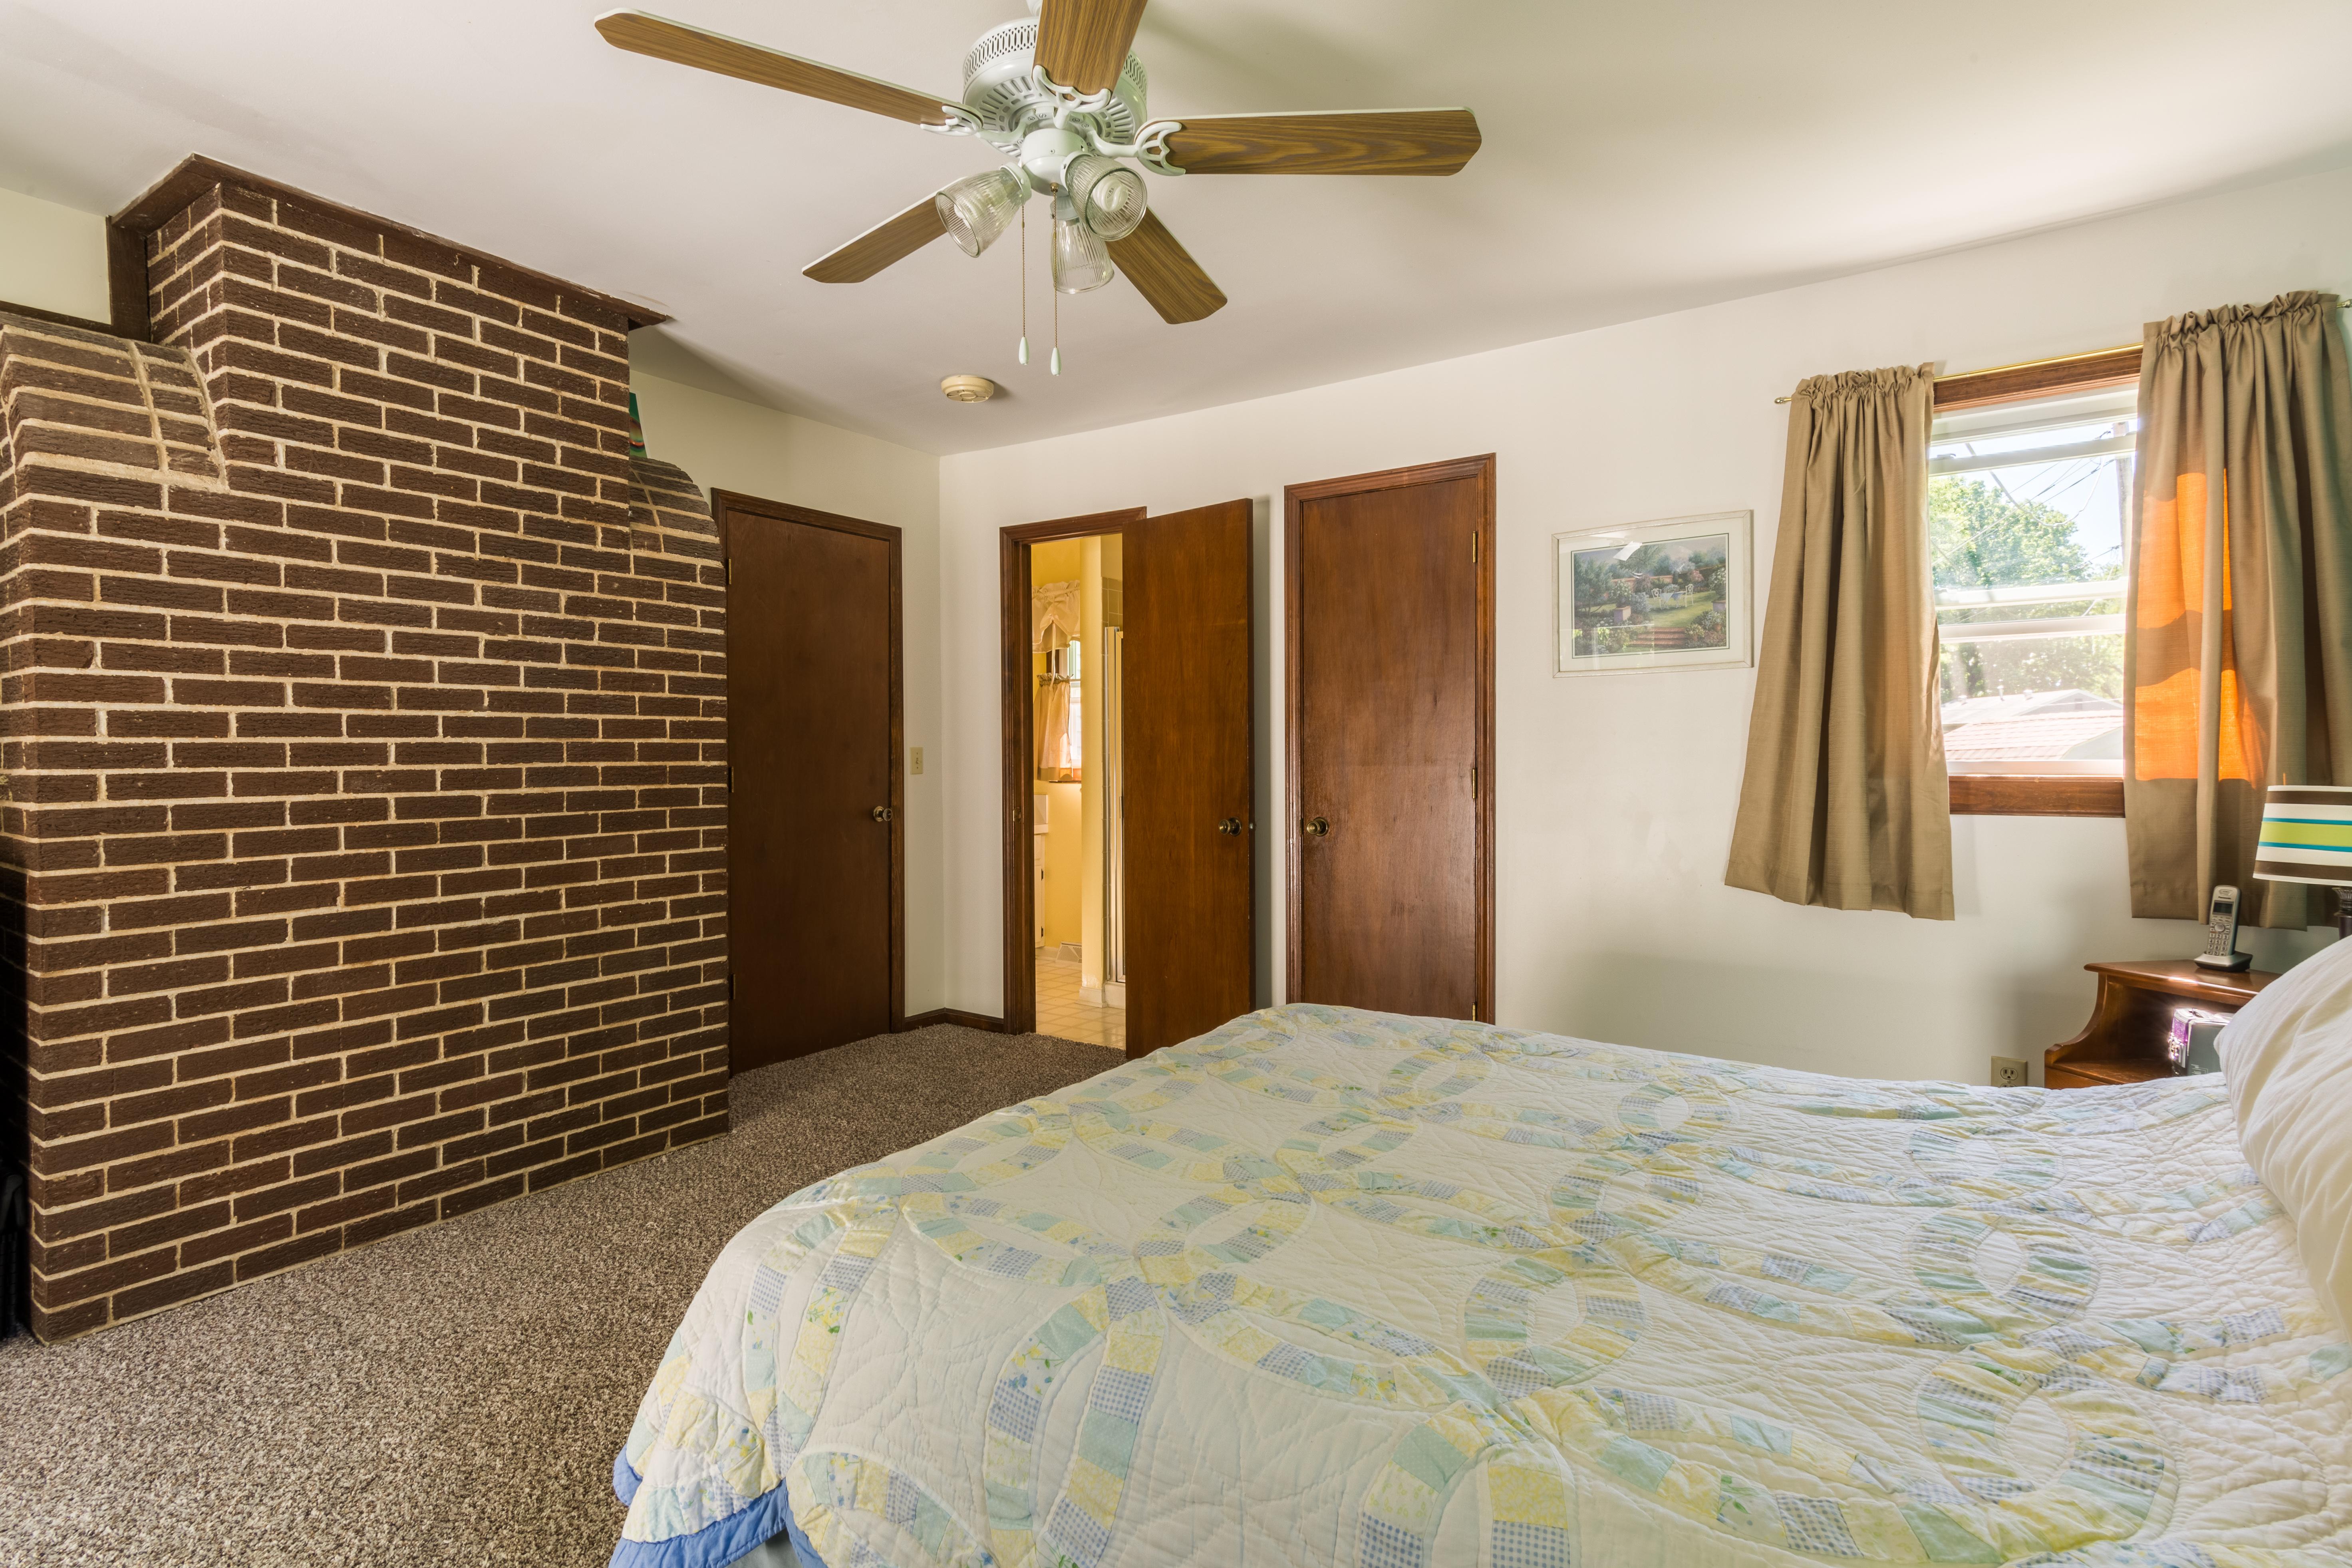 12109 W 60Th Terrace, Shawnee-19